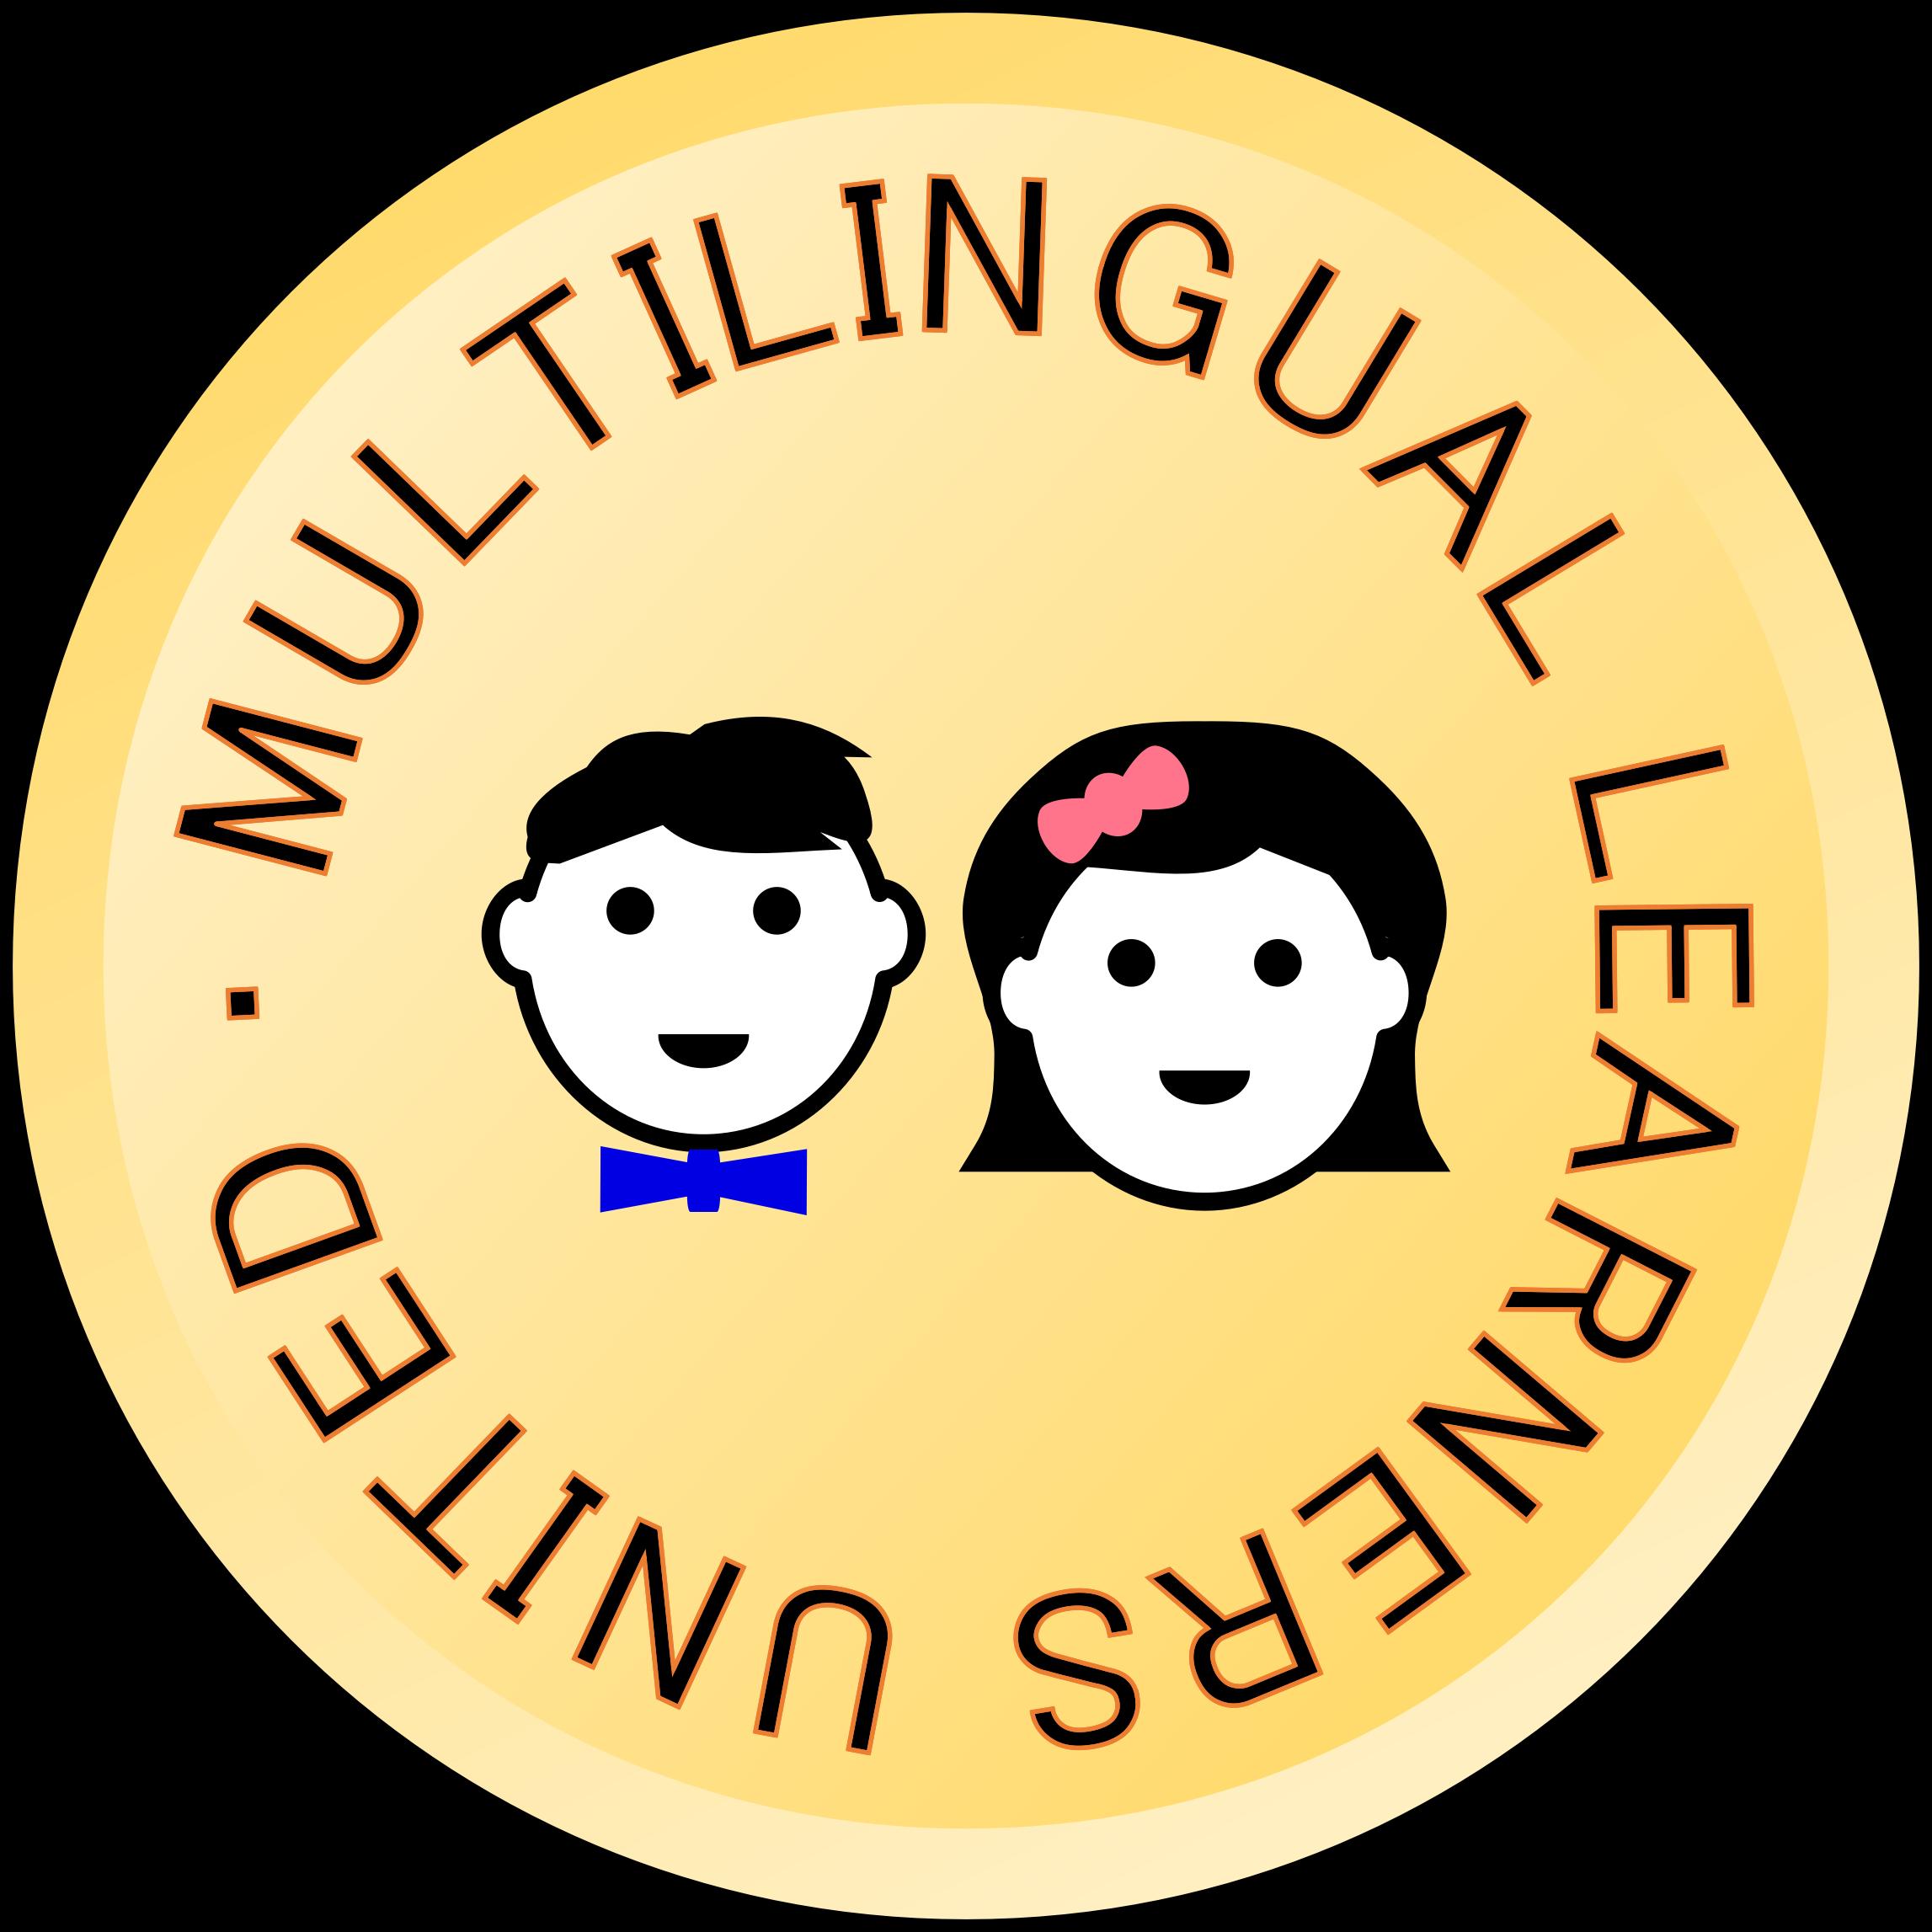 jpg free stock Language clipart multilingual. Learners united big image.